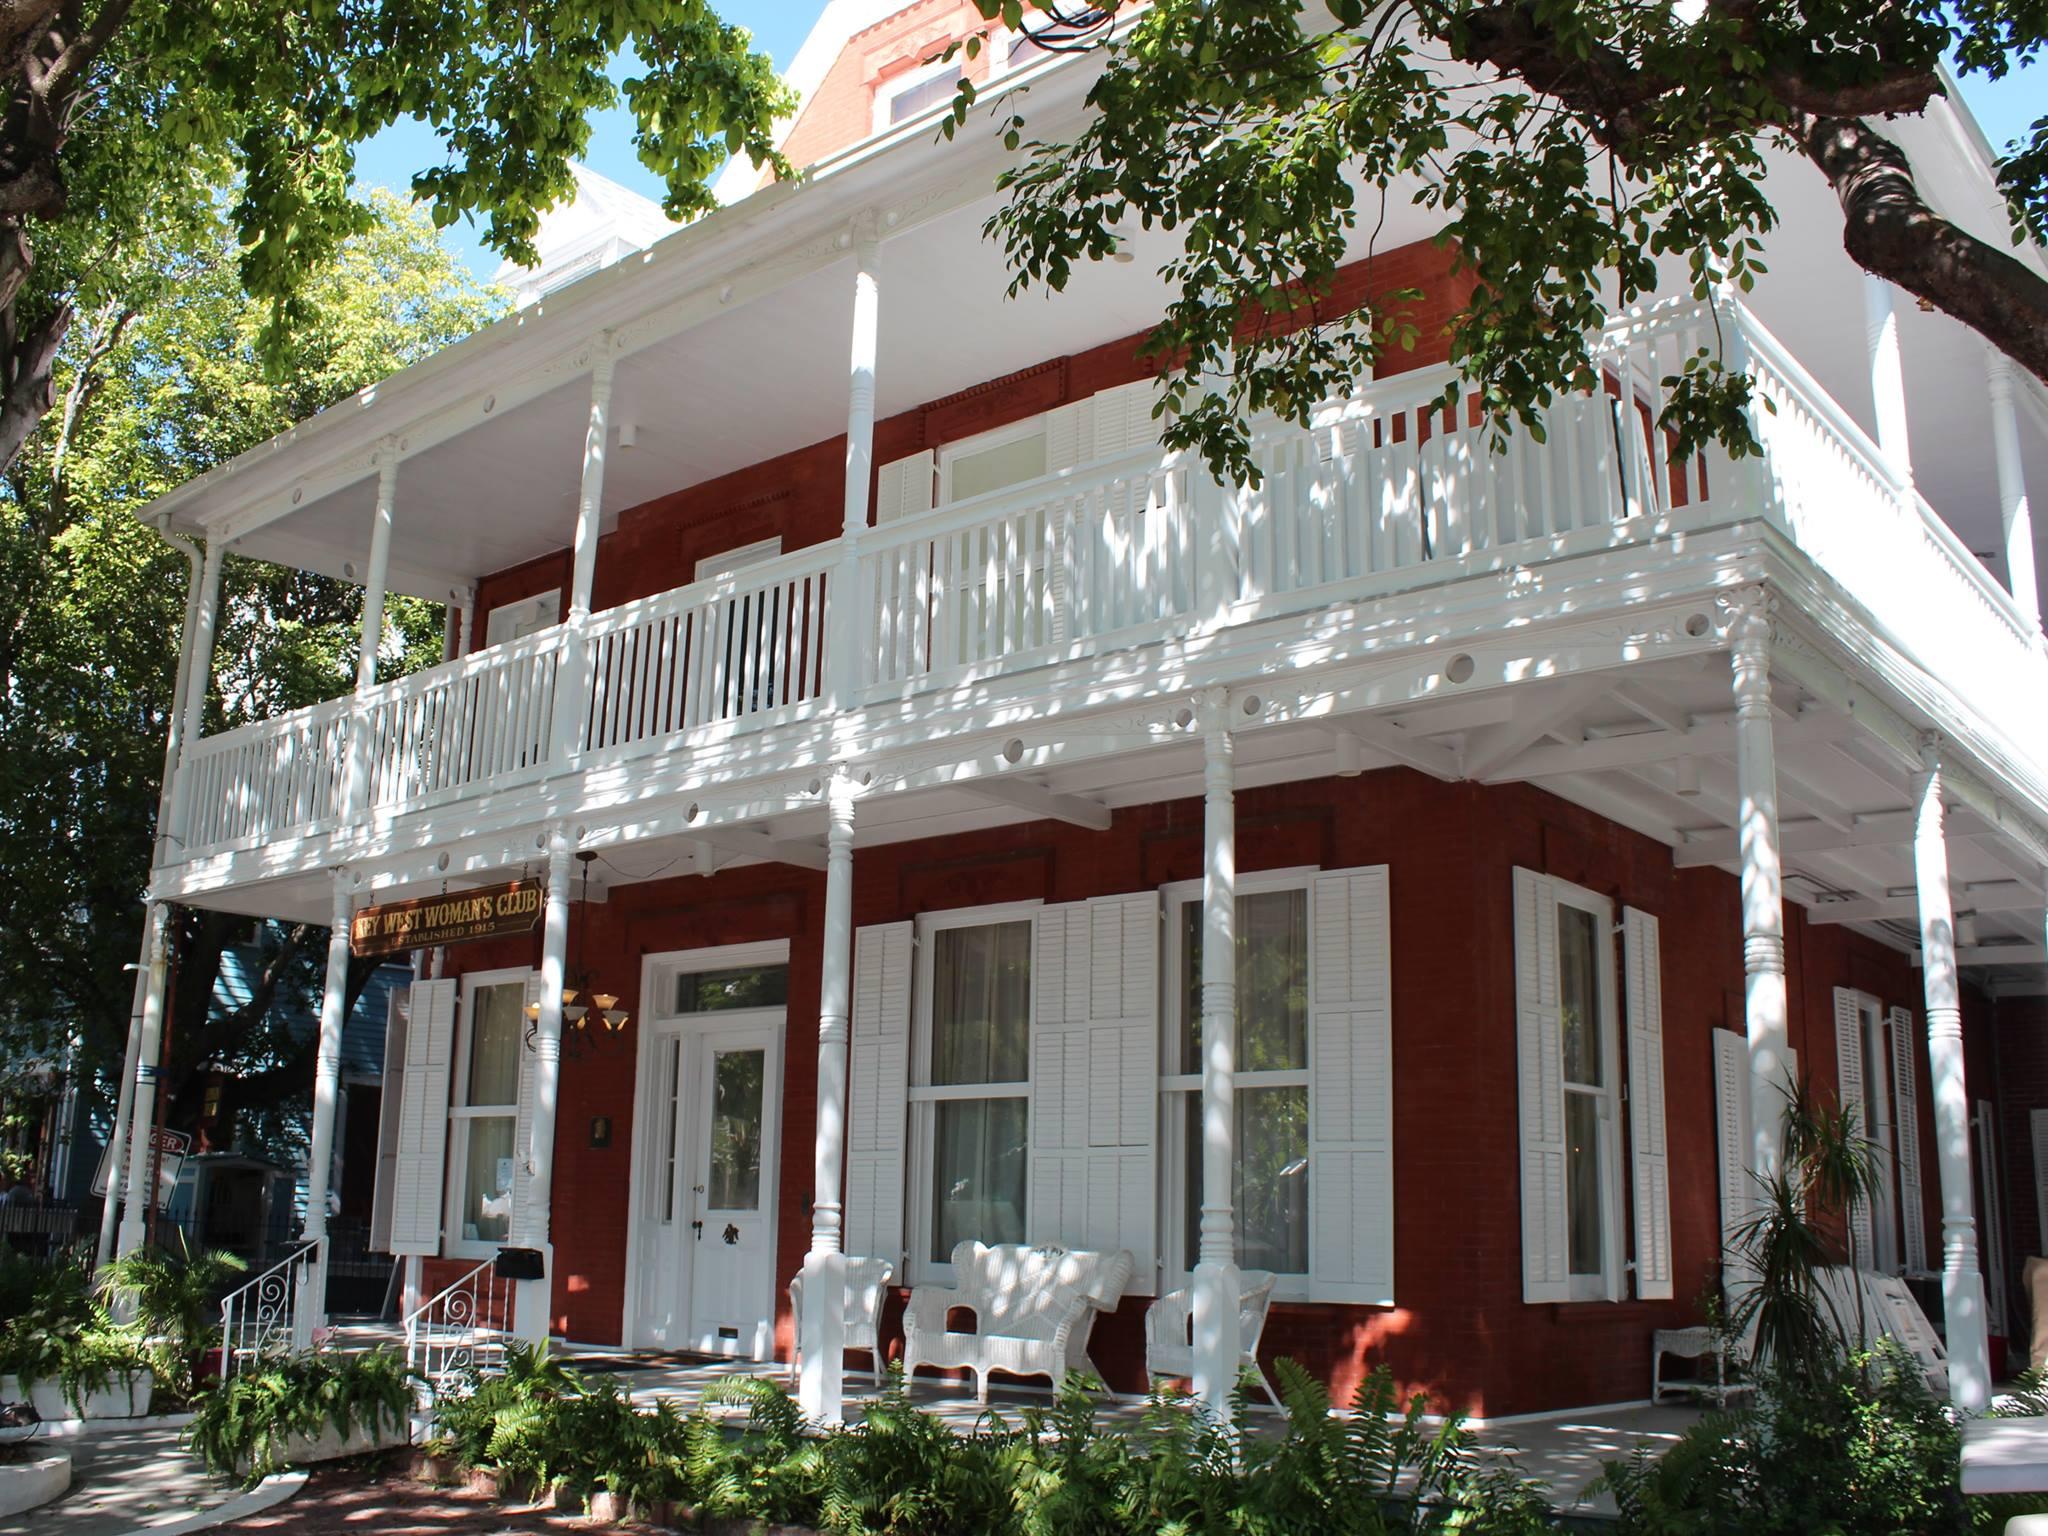 Key West Woman's Club -- Hellings House